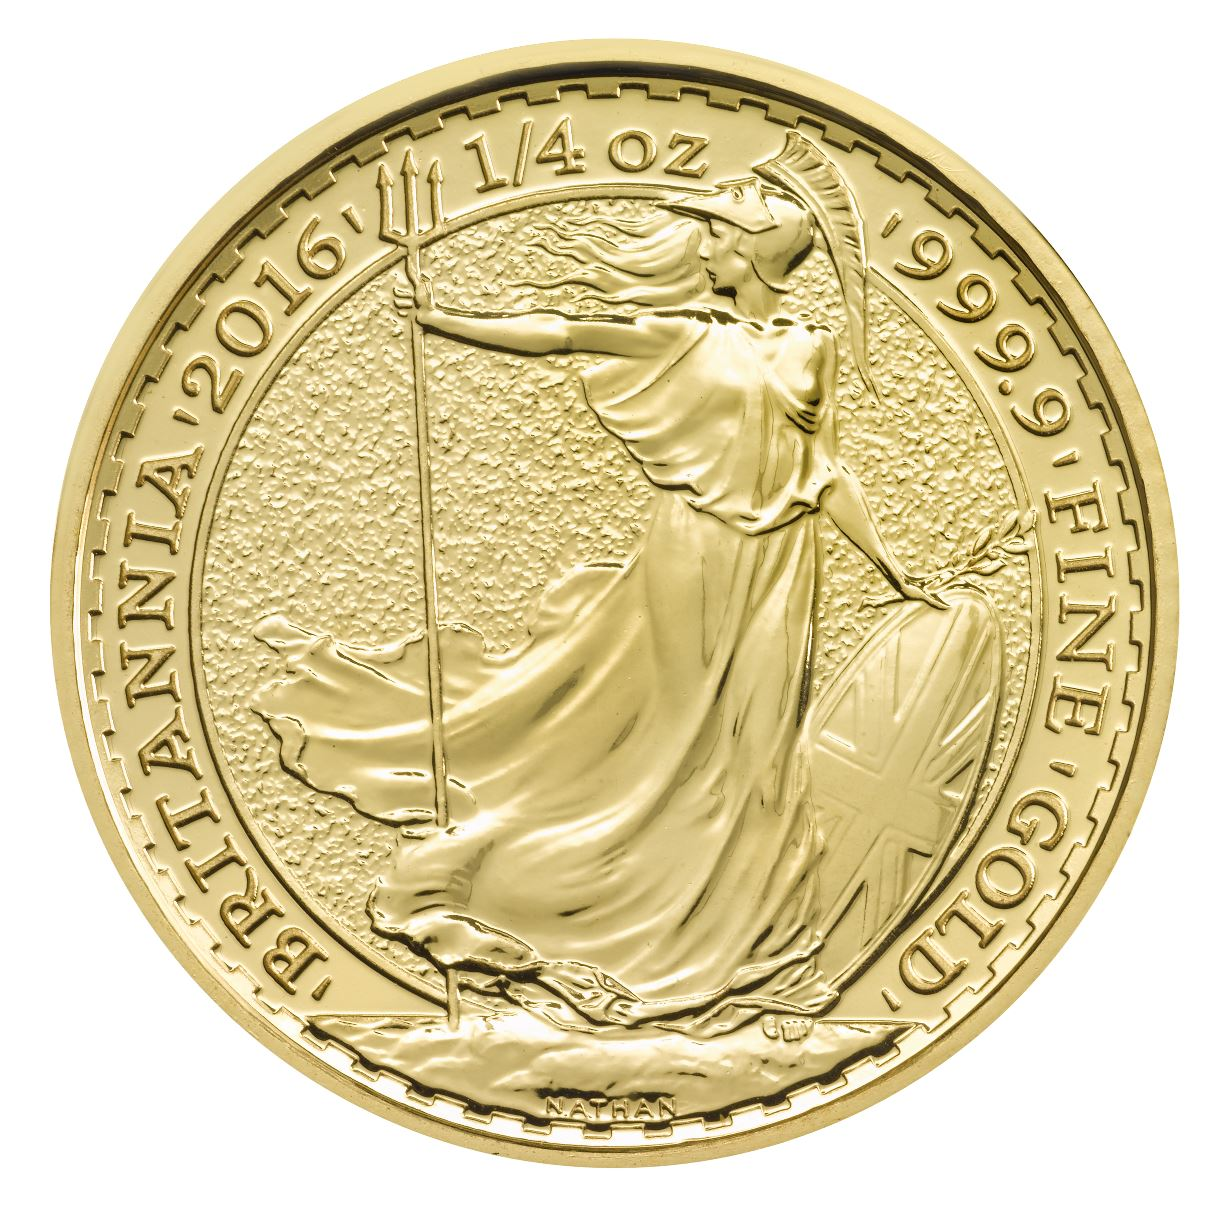 2016 Quarter Ounce Britannia Gold Coins